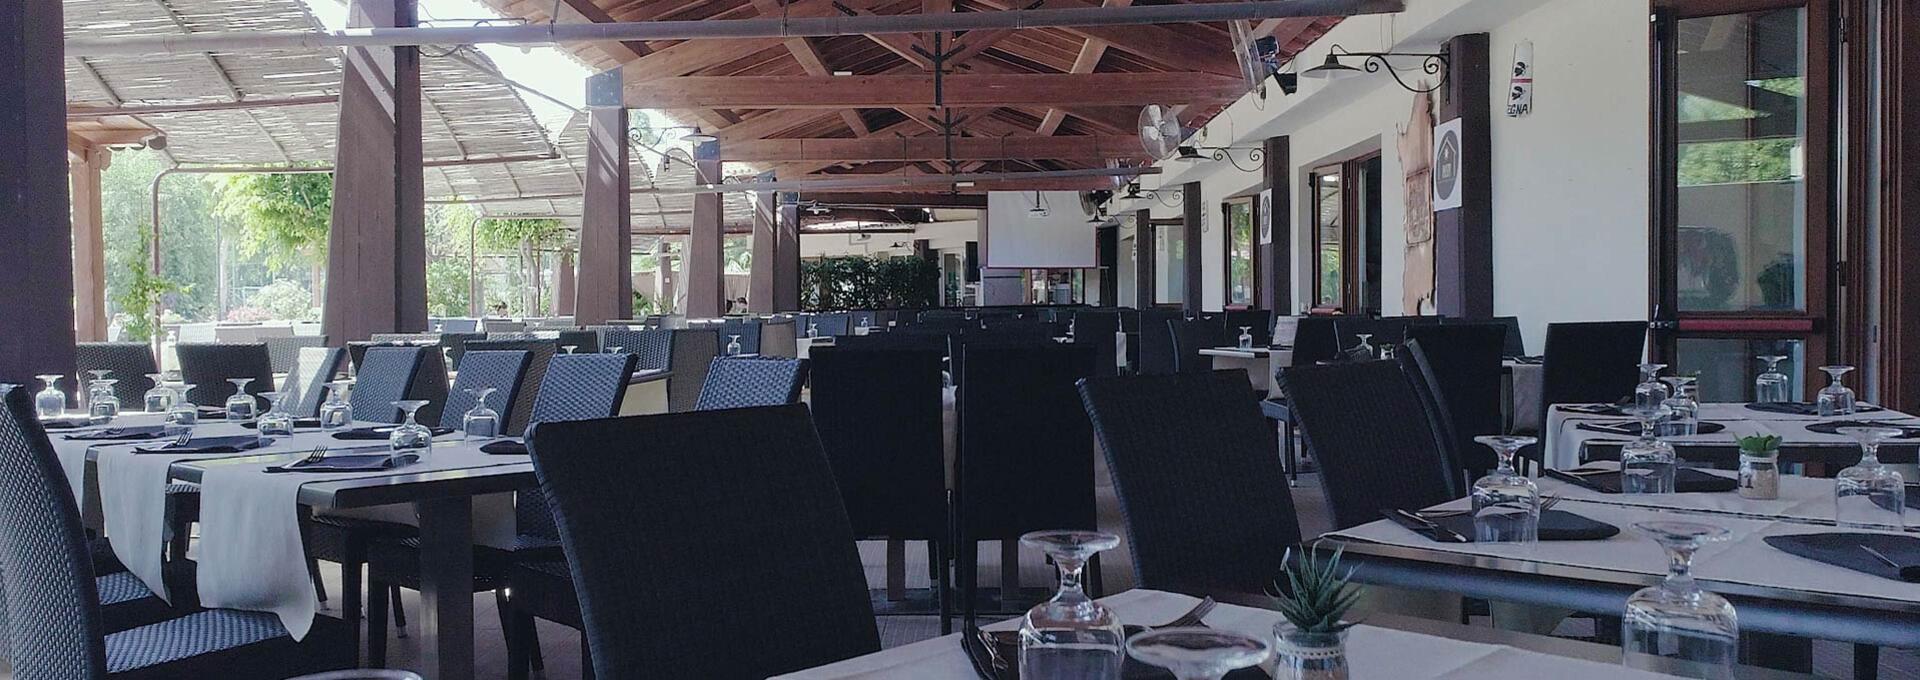 4mori fr camping-village-avec-restaurant-sardaigne 018